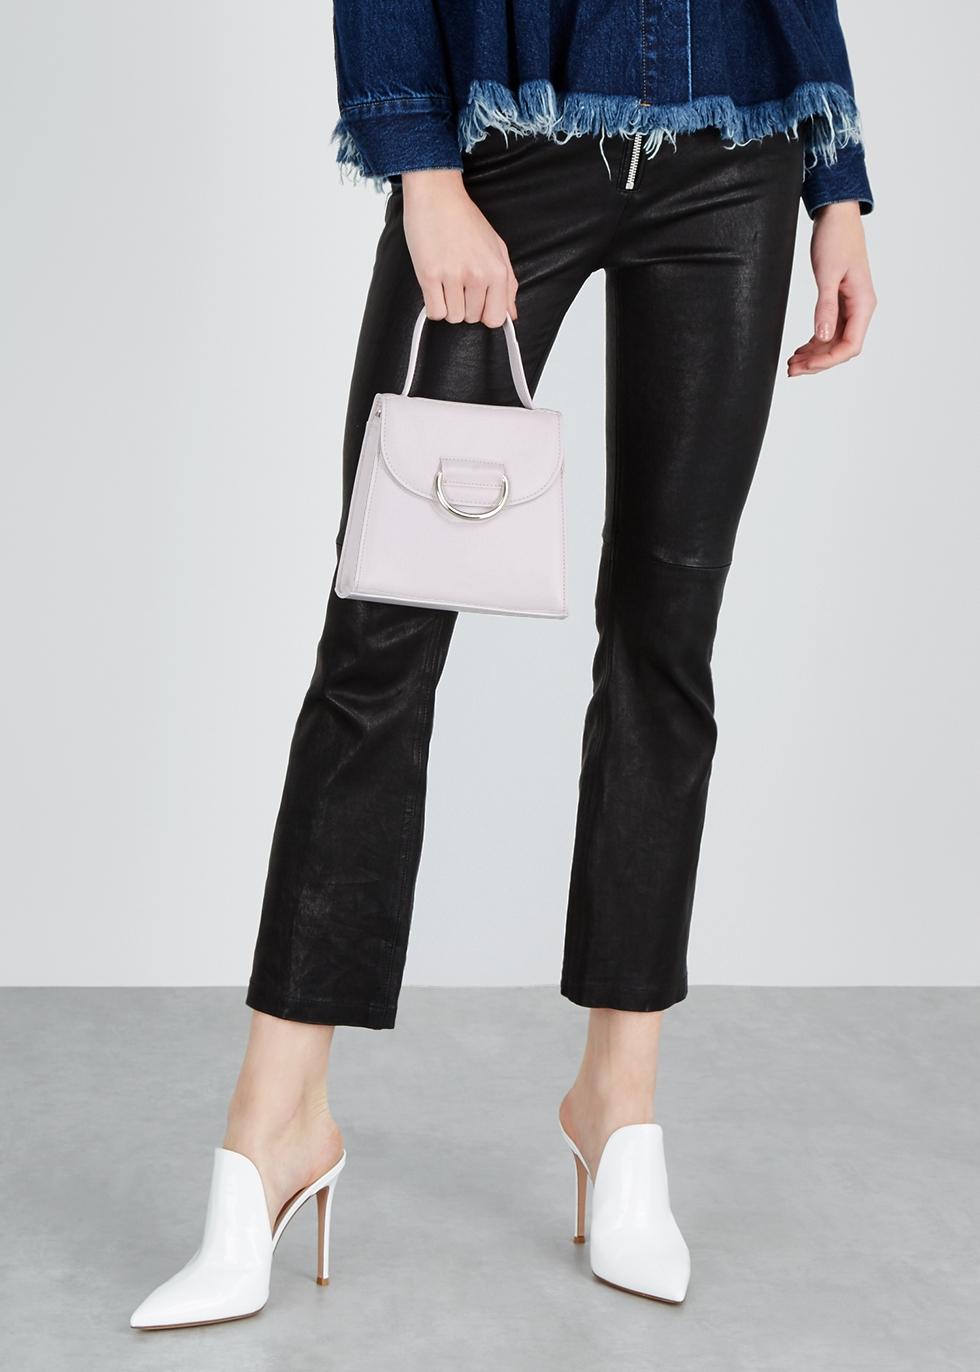 Women s Designer Cross-Body Bags - Harvey Nichols 1ea74a63971e4